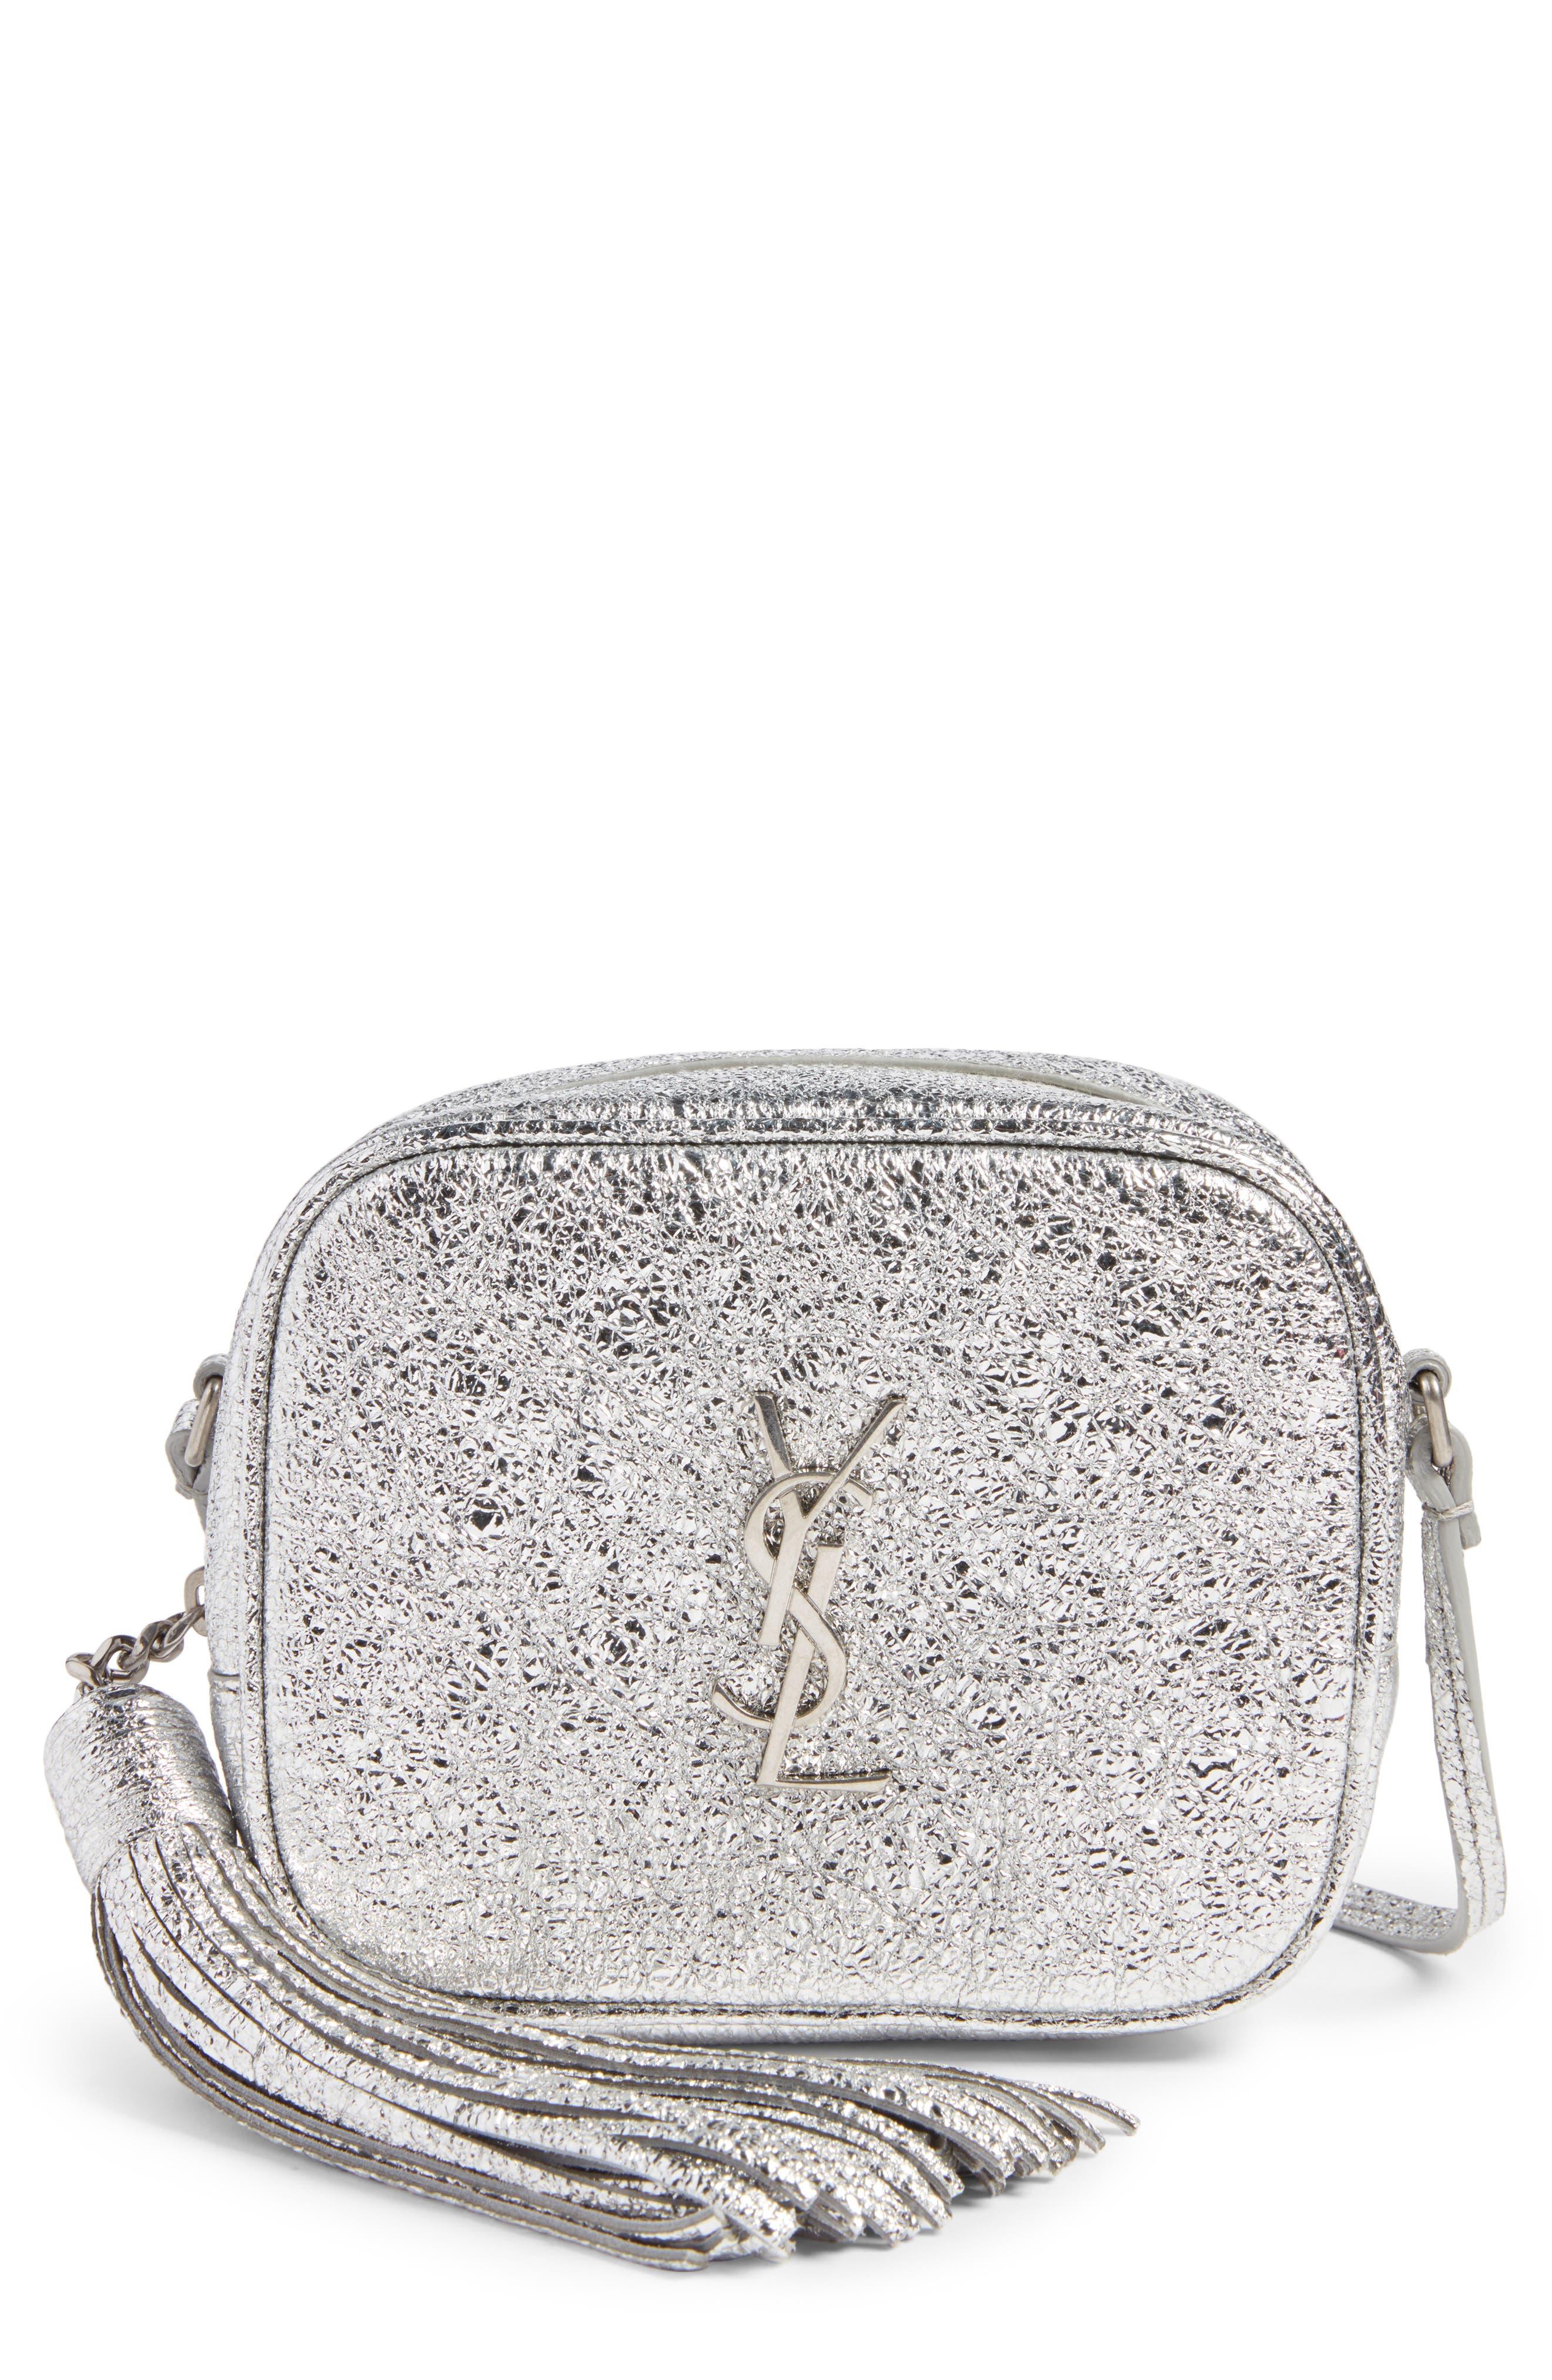 Saint Laurent Monogram Blogger Calfskin Crossbody Bag